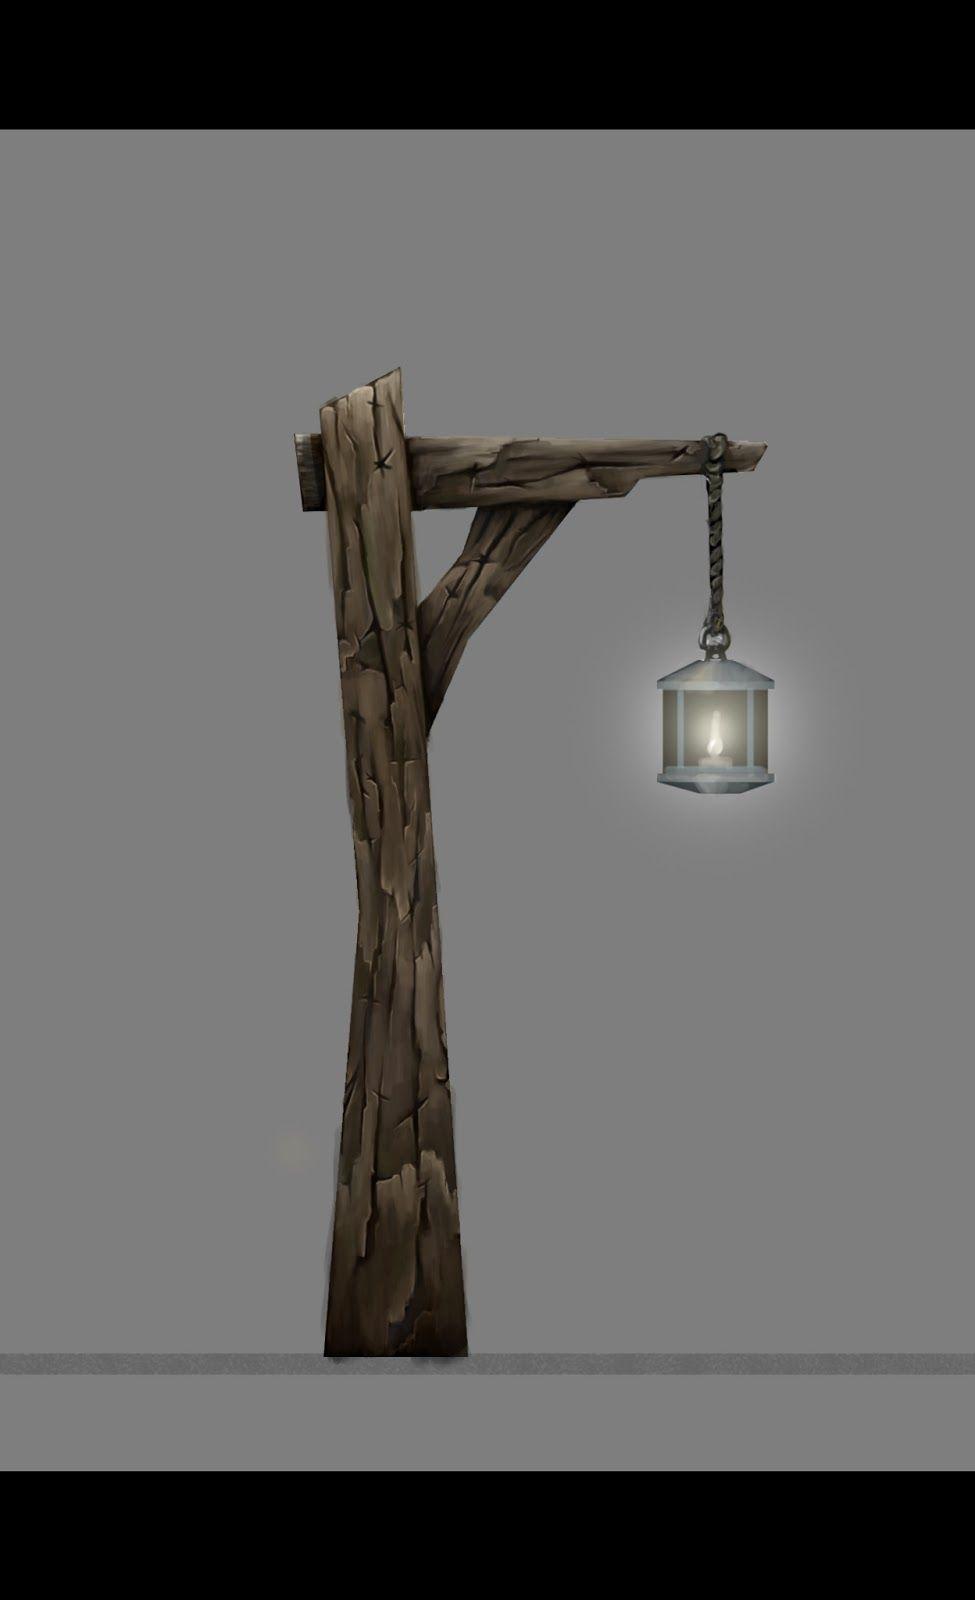 Wood Lamp Post Google Search Mom S Garden Lamp Post